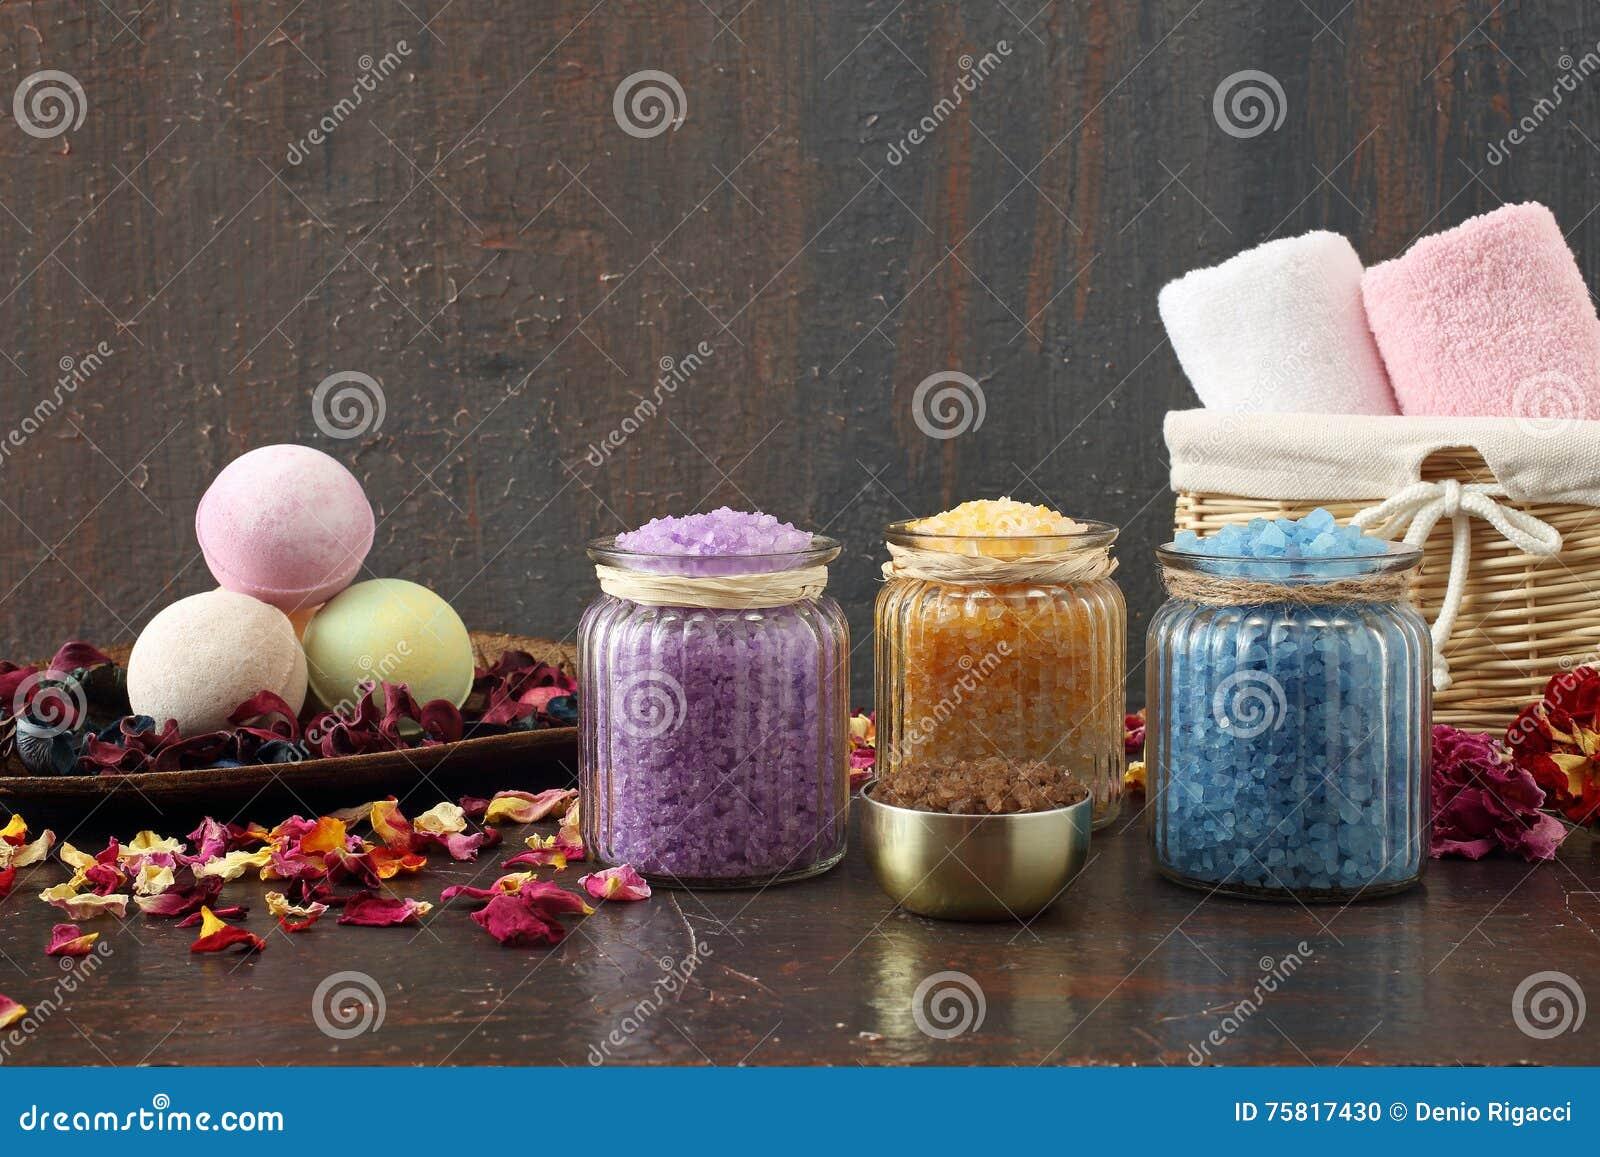 Aromatherapy asortowane kąpielowe sole